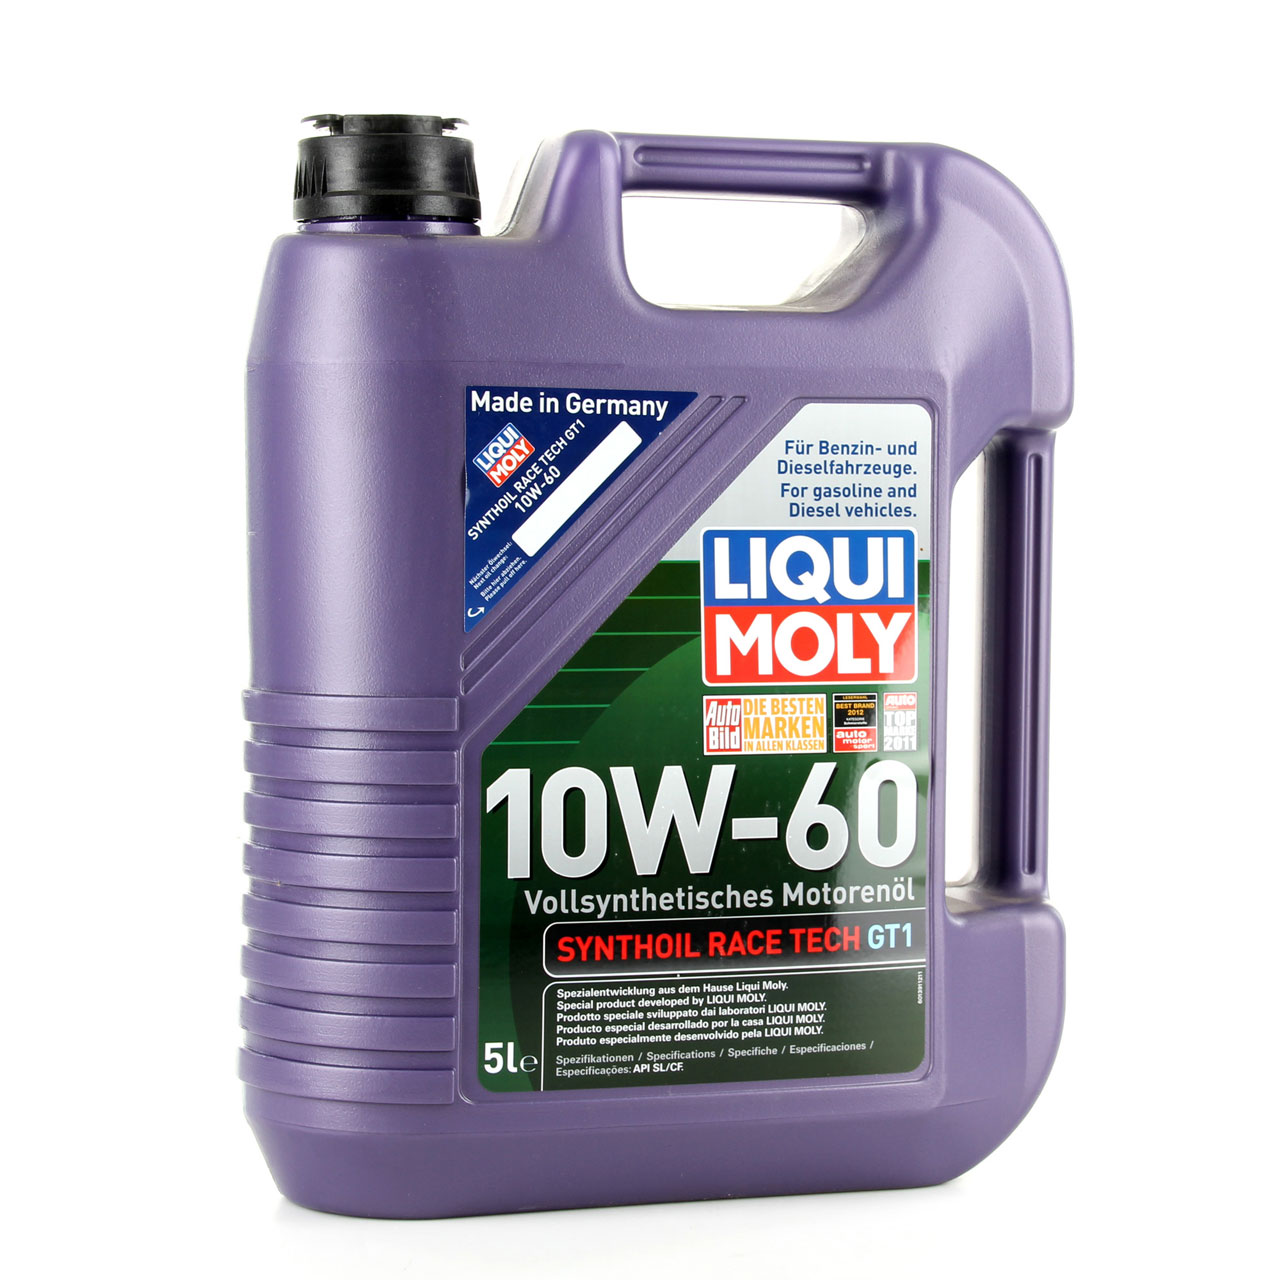 LIQUI MOLY Motoröl Öl SYNTHOIL RACE TECH GT1 10W60 10W-60 10L 10 Liter 1391